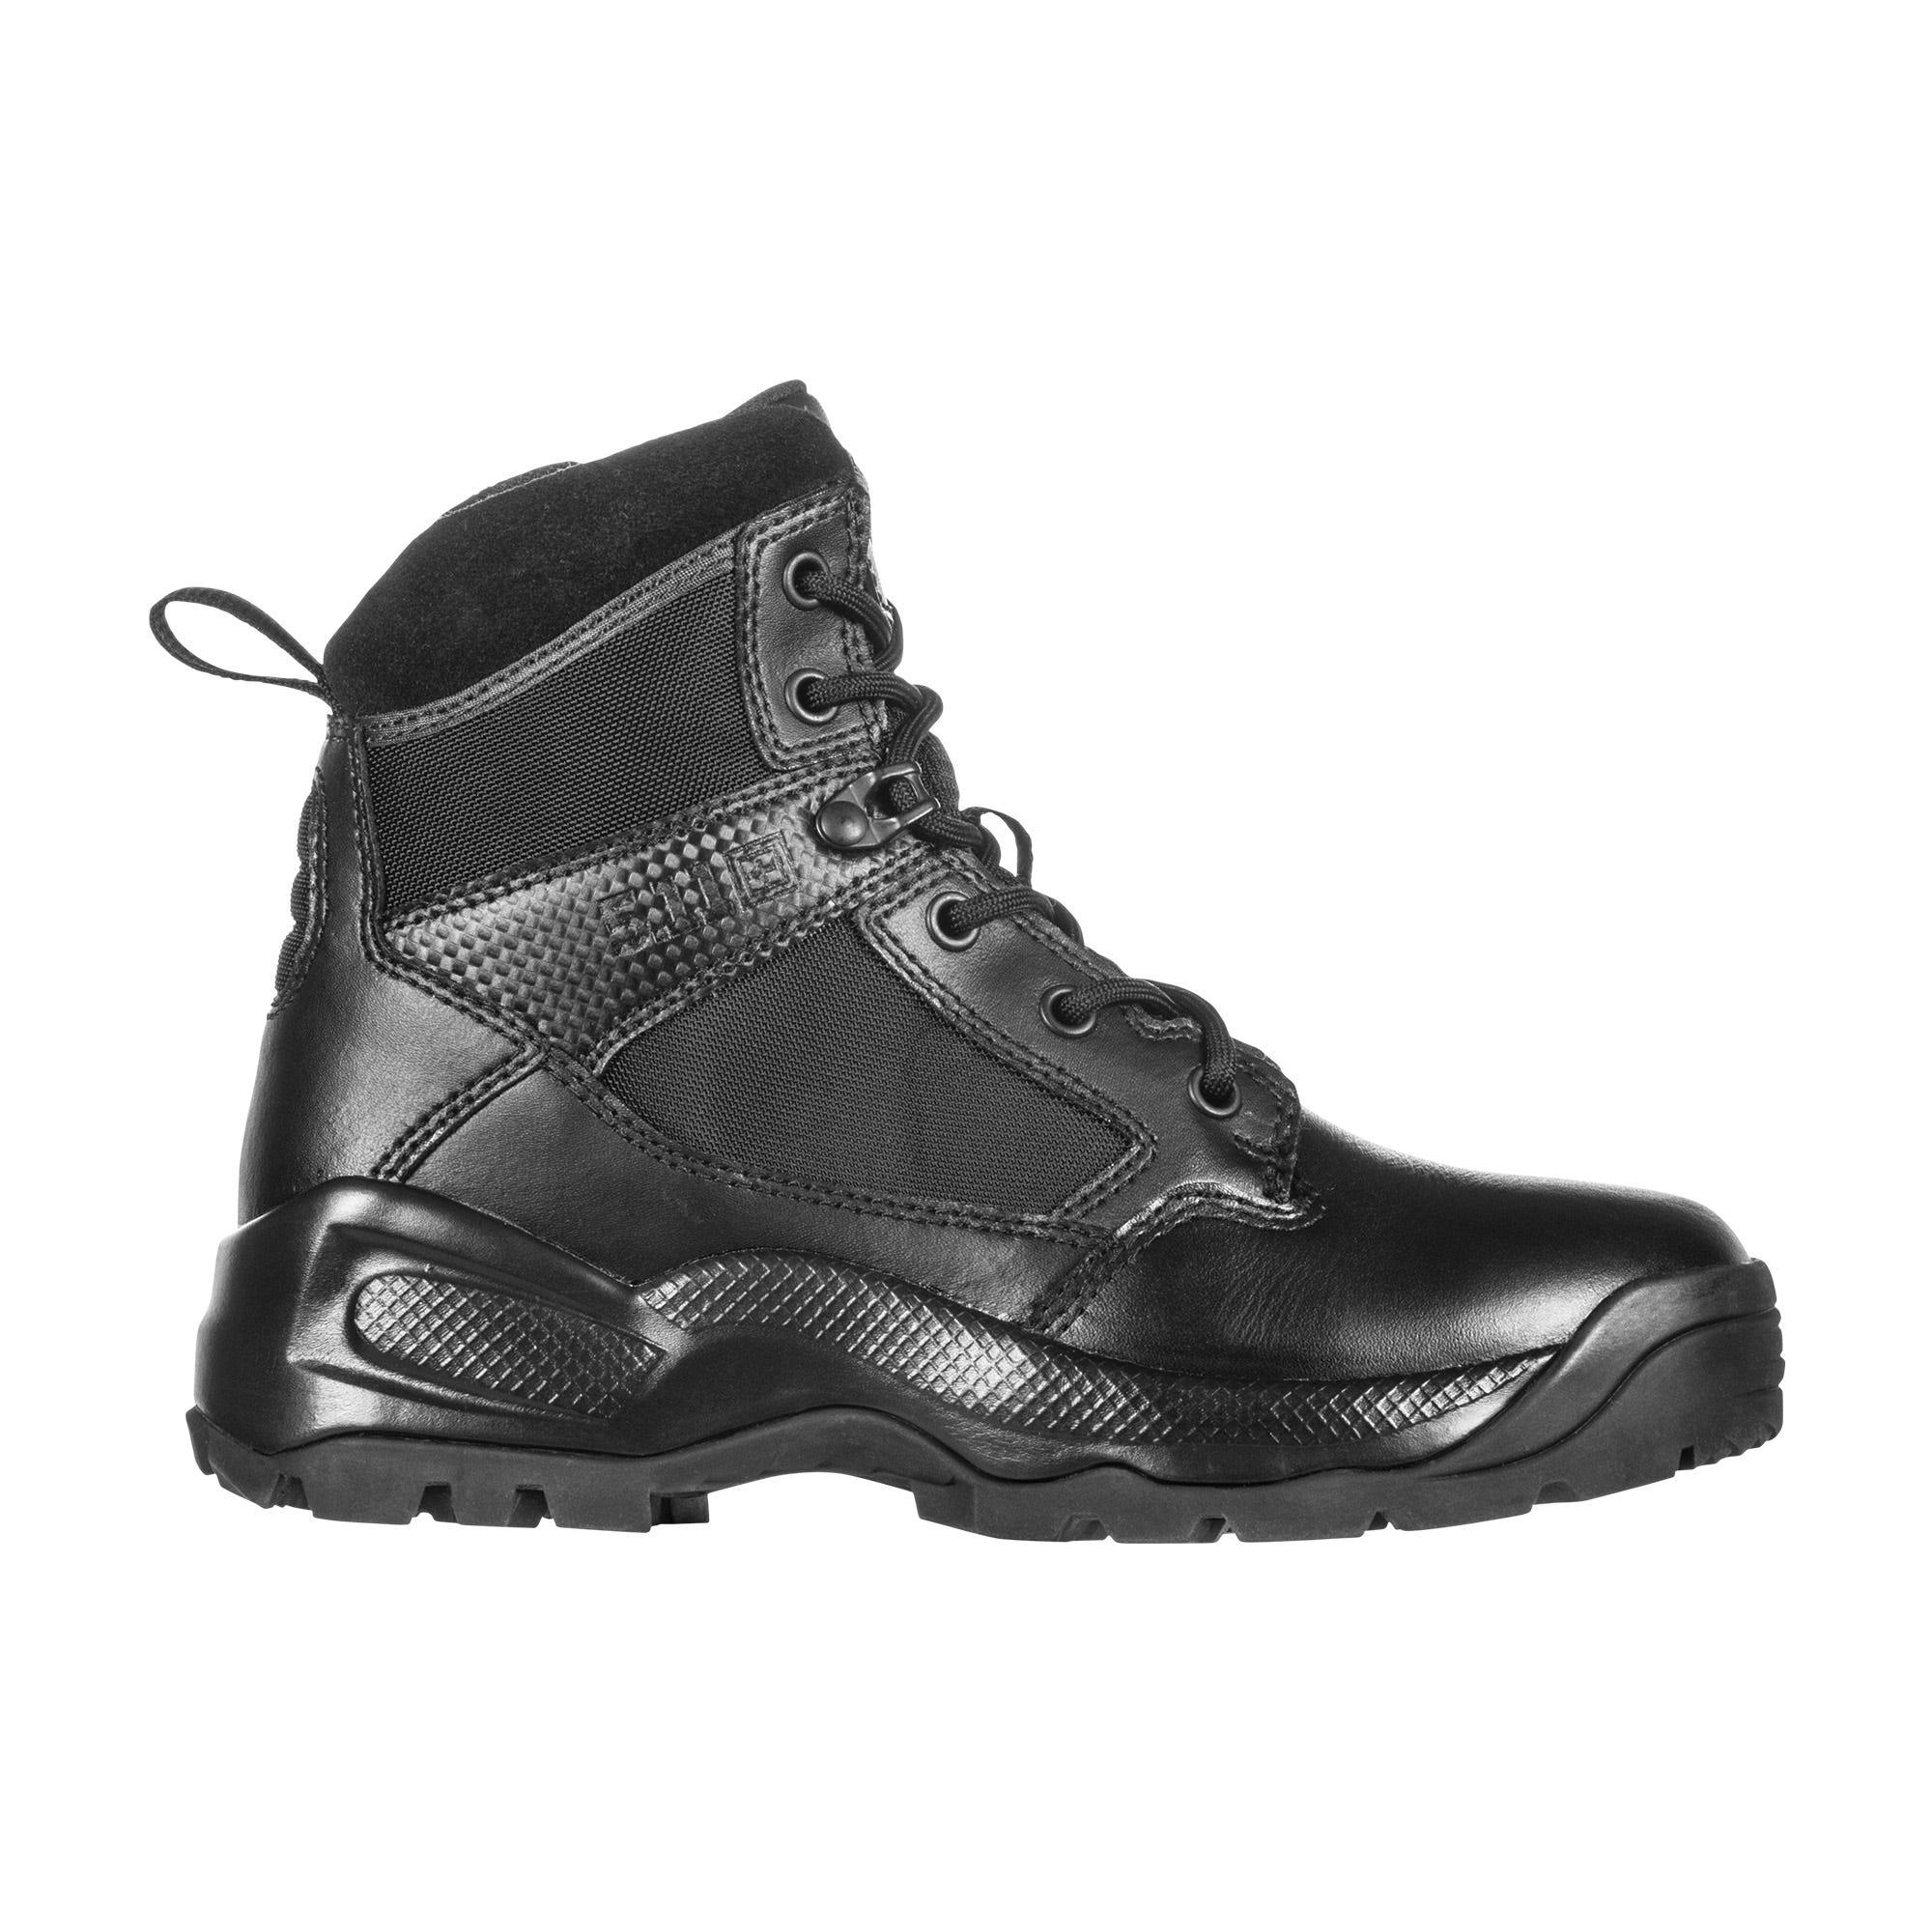 5.11 Tactical Women's Womens ATAC 2.0 6 Side Zip Boot thumbnail